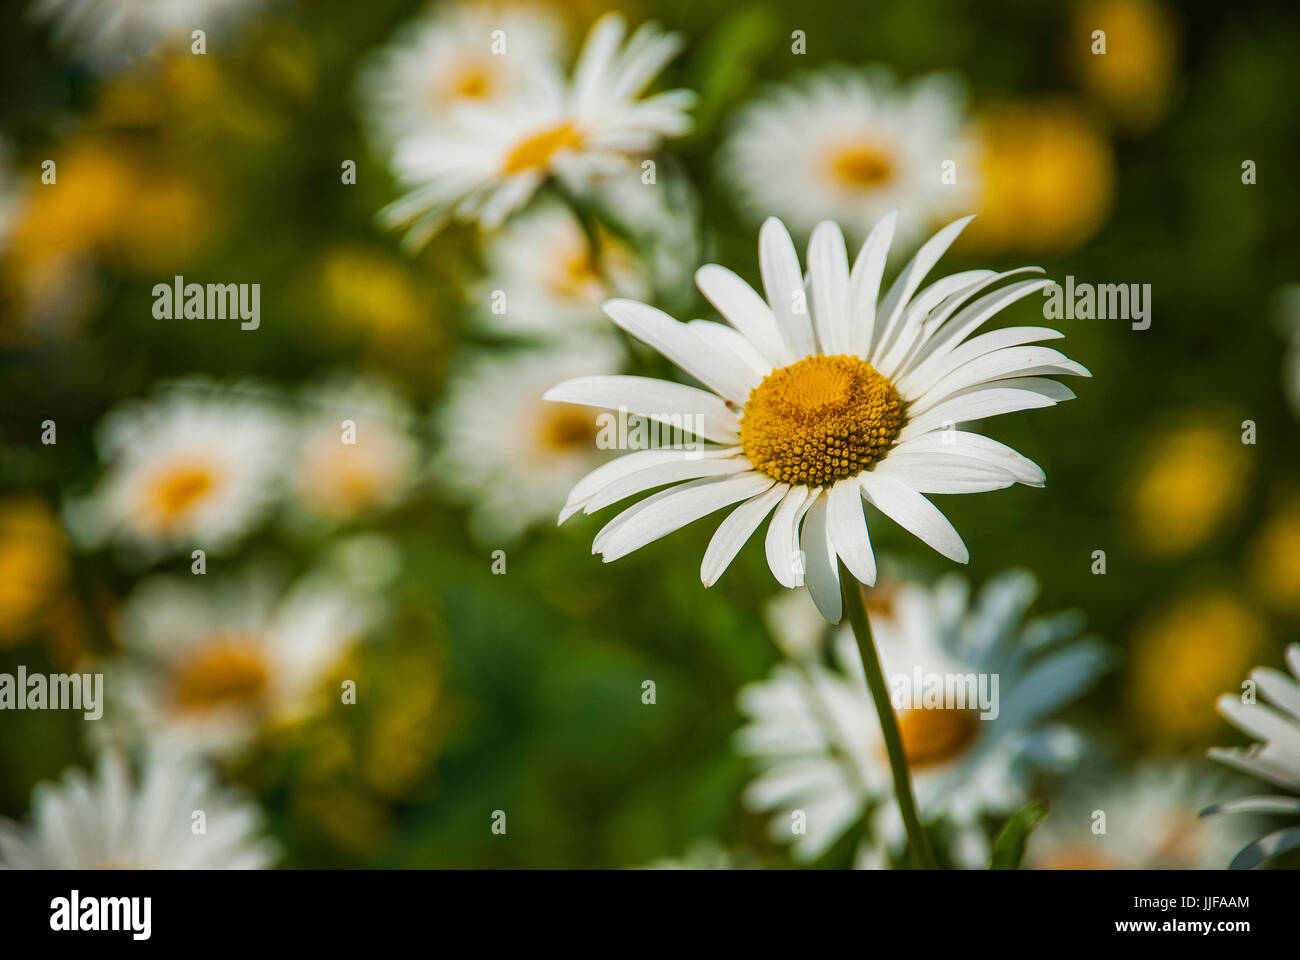 Wild daisies flowers stock photo 149084172 alamy wild daisies flowers izmirmasajfo